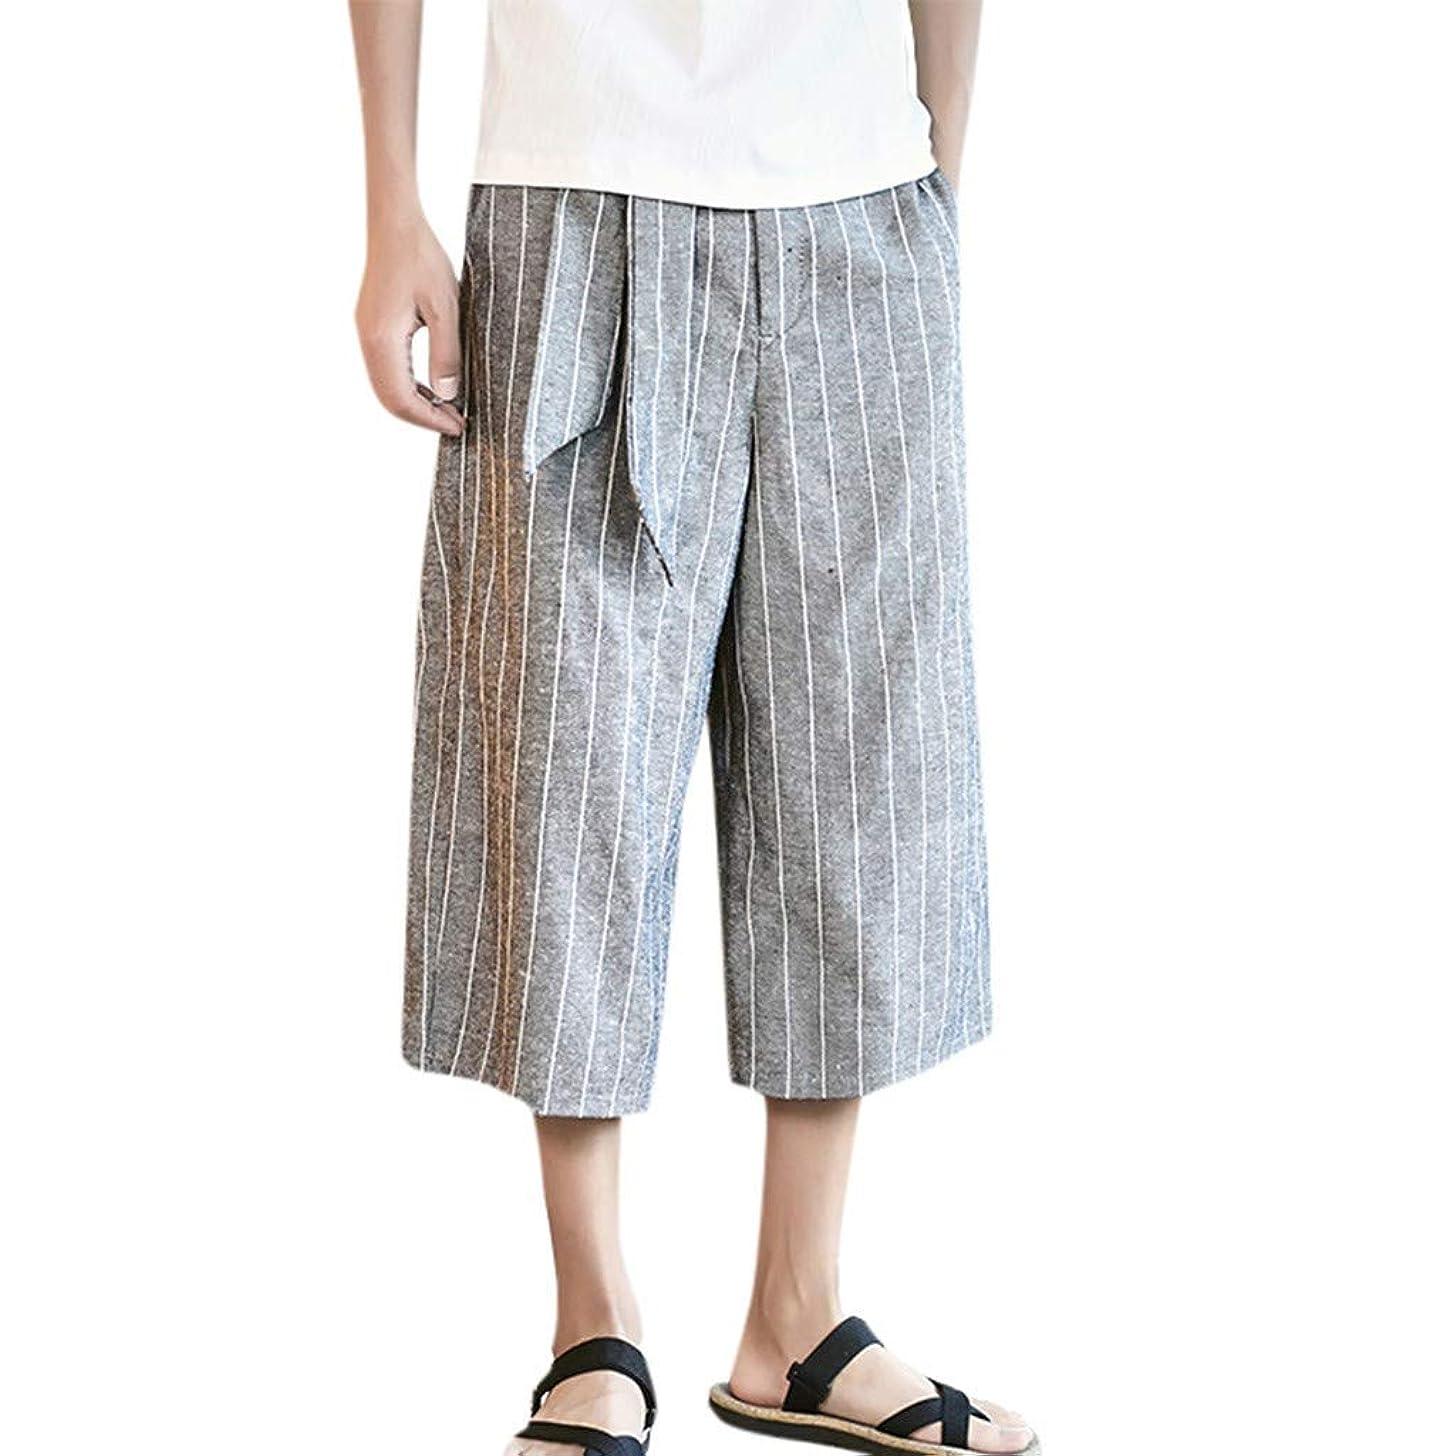 BingYELH Men's Casual Loose Fit Straight-Legs Stretchy Waist Beach Pants Drawstring Gym Fitness Joggers Workout Yoga Pants